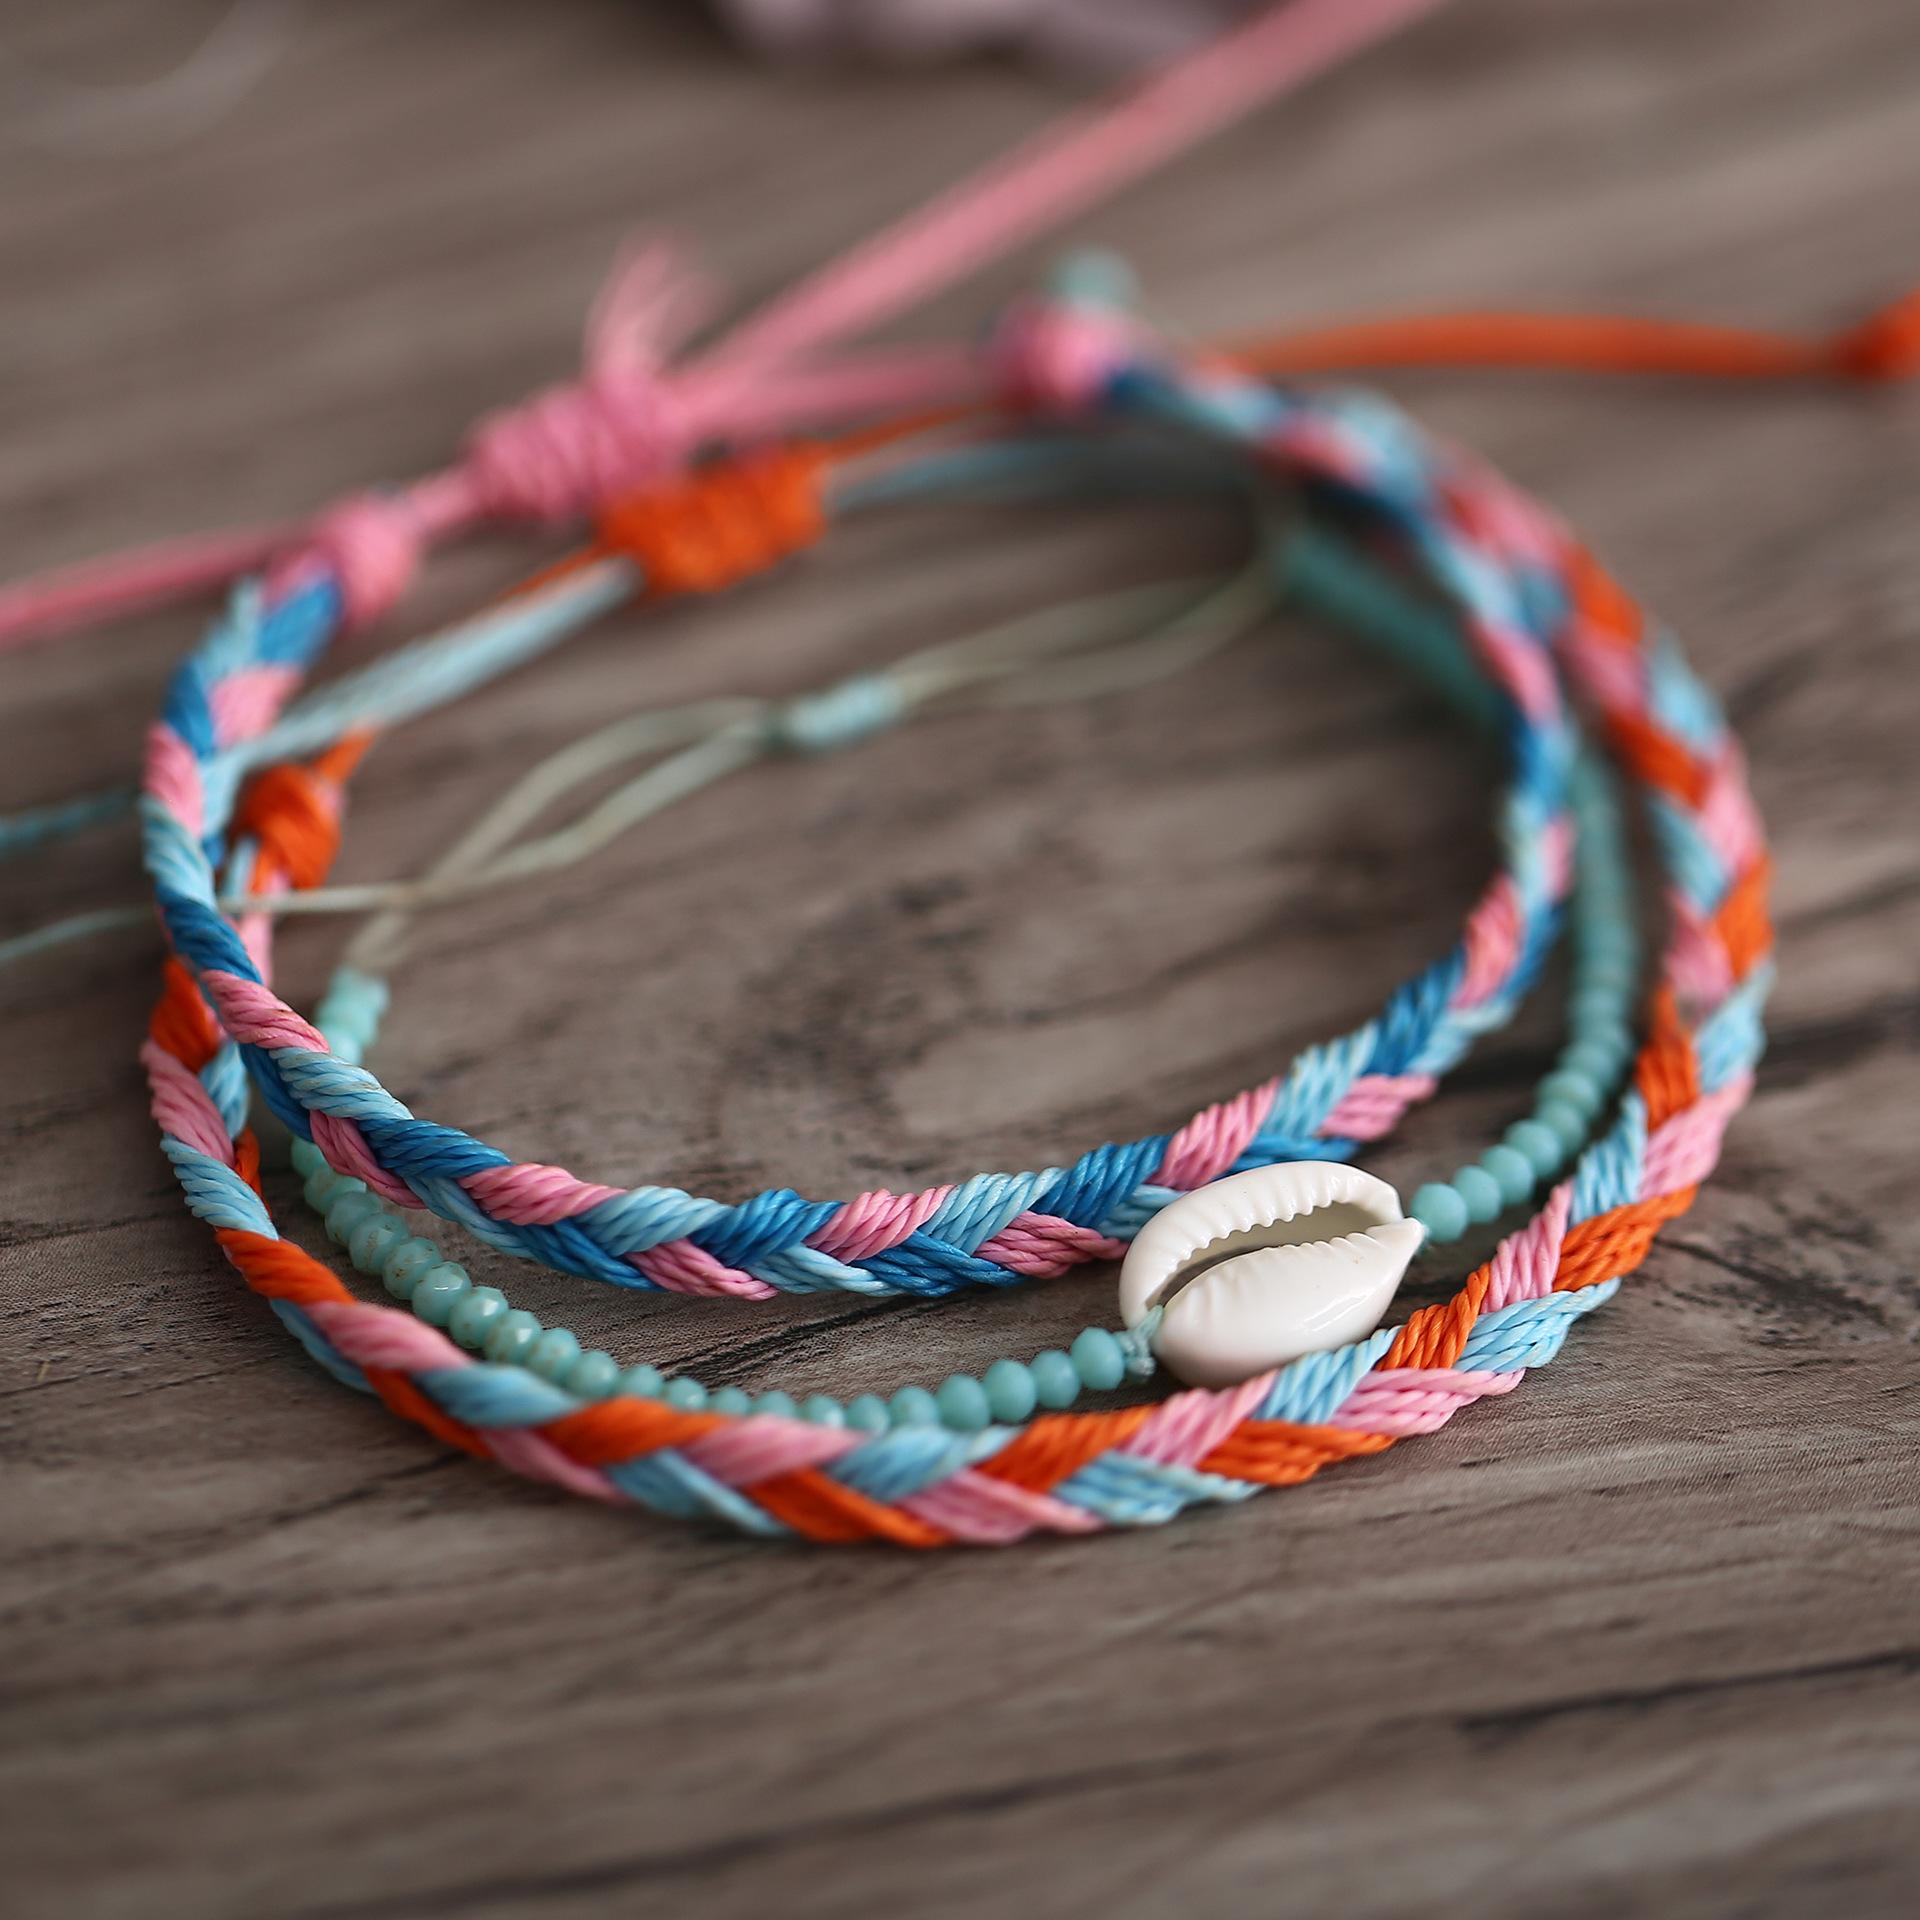 Alloy Fashion bolso cesta bracelet  GFB0201  Fashion Jewelry NHPJ0303GFB0201